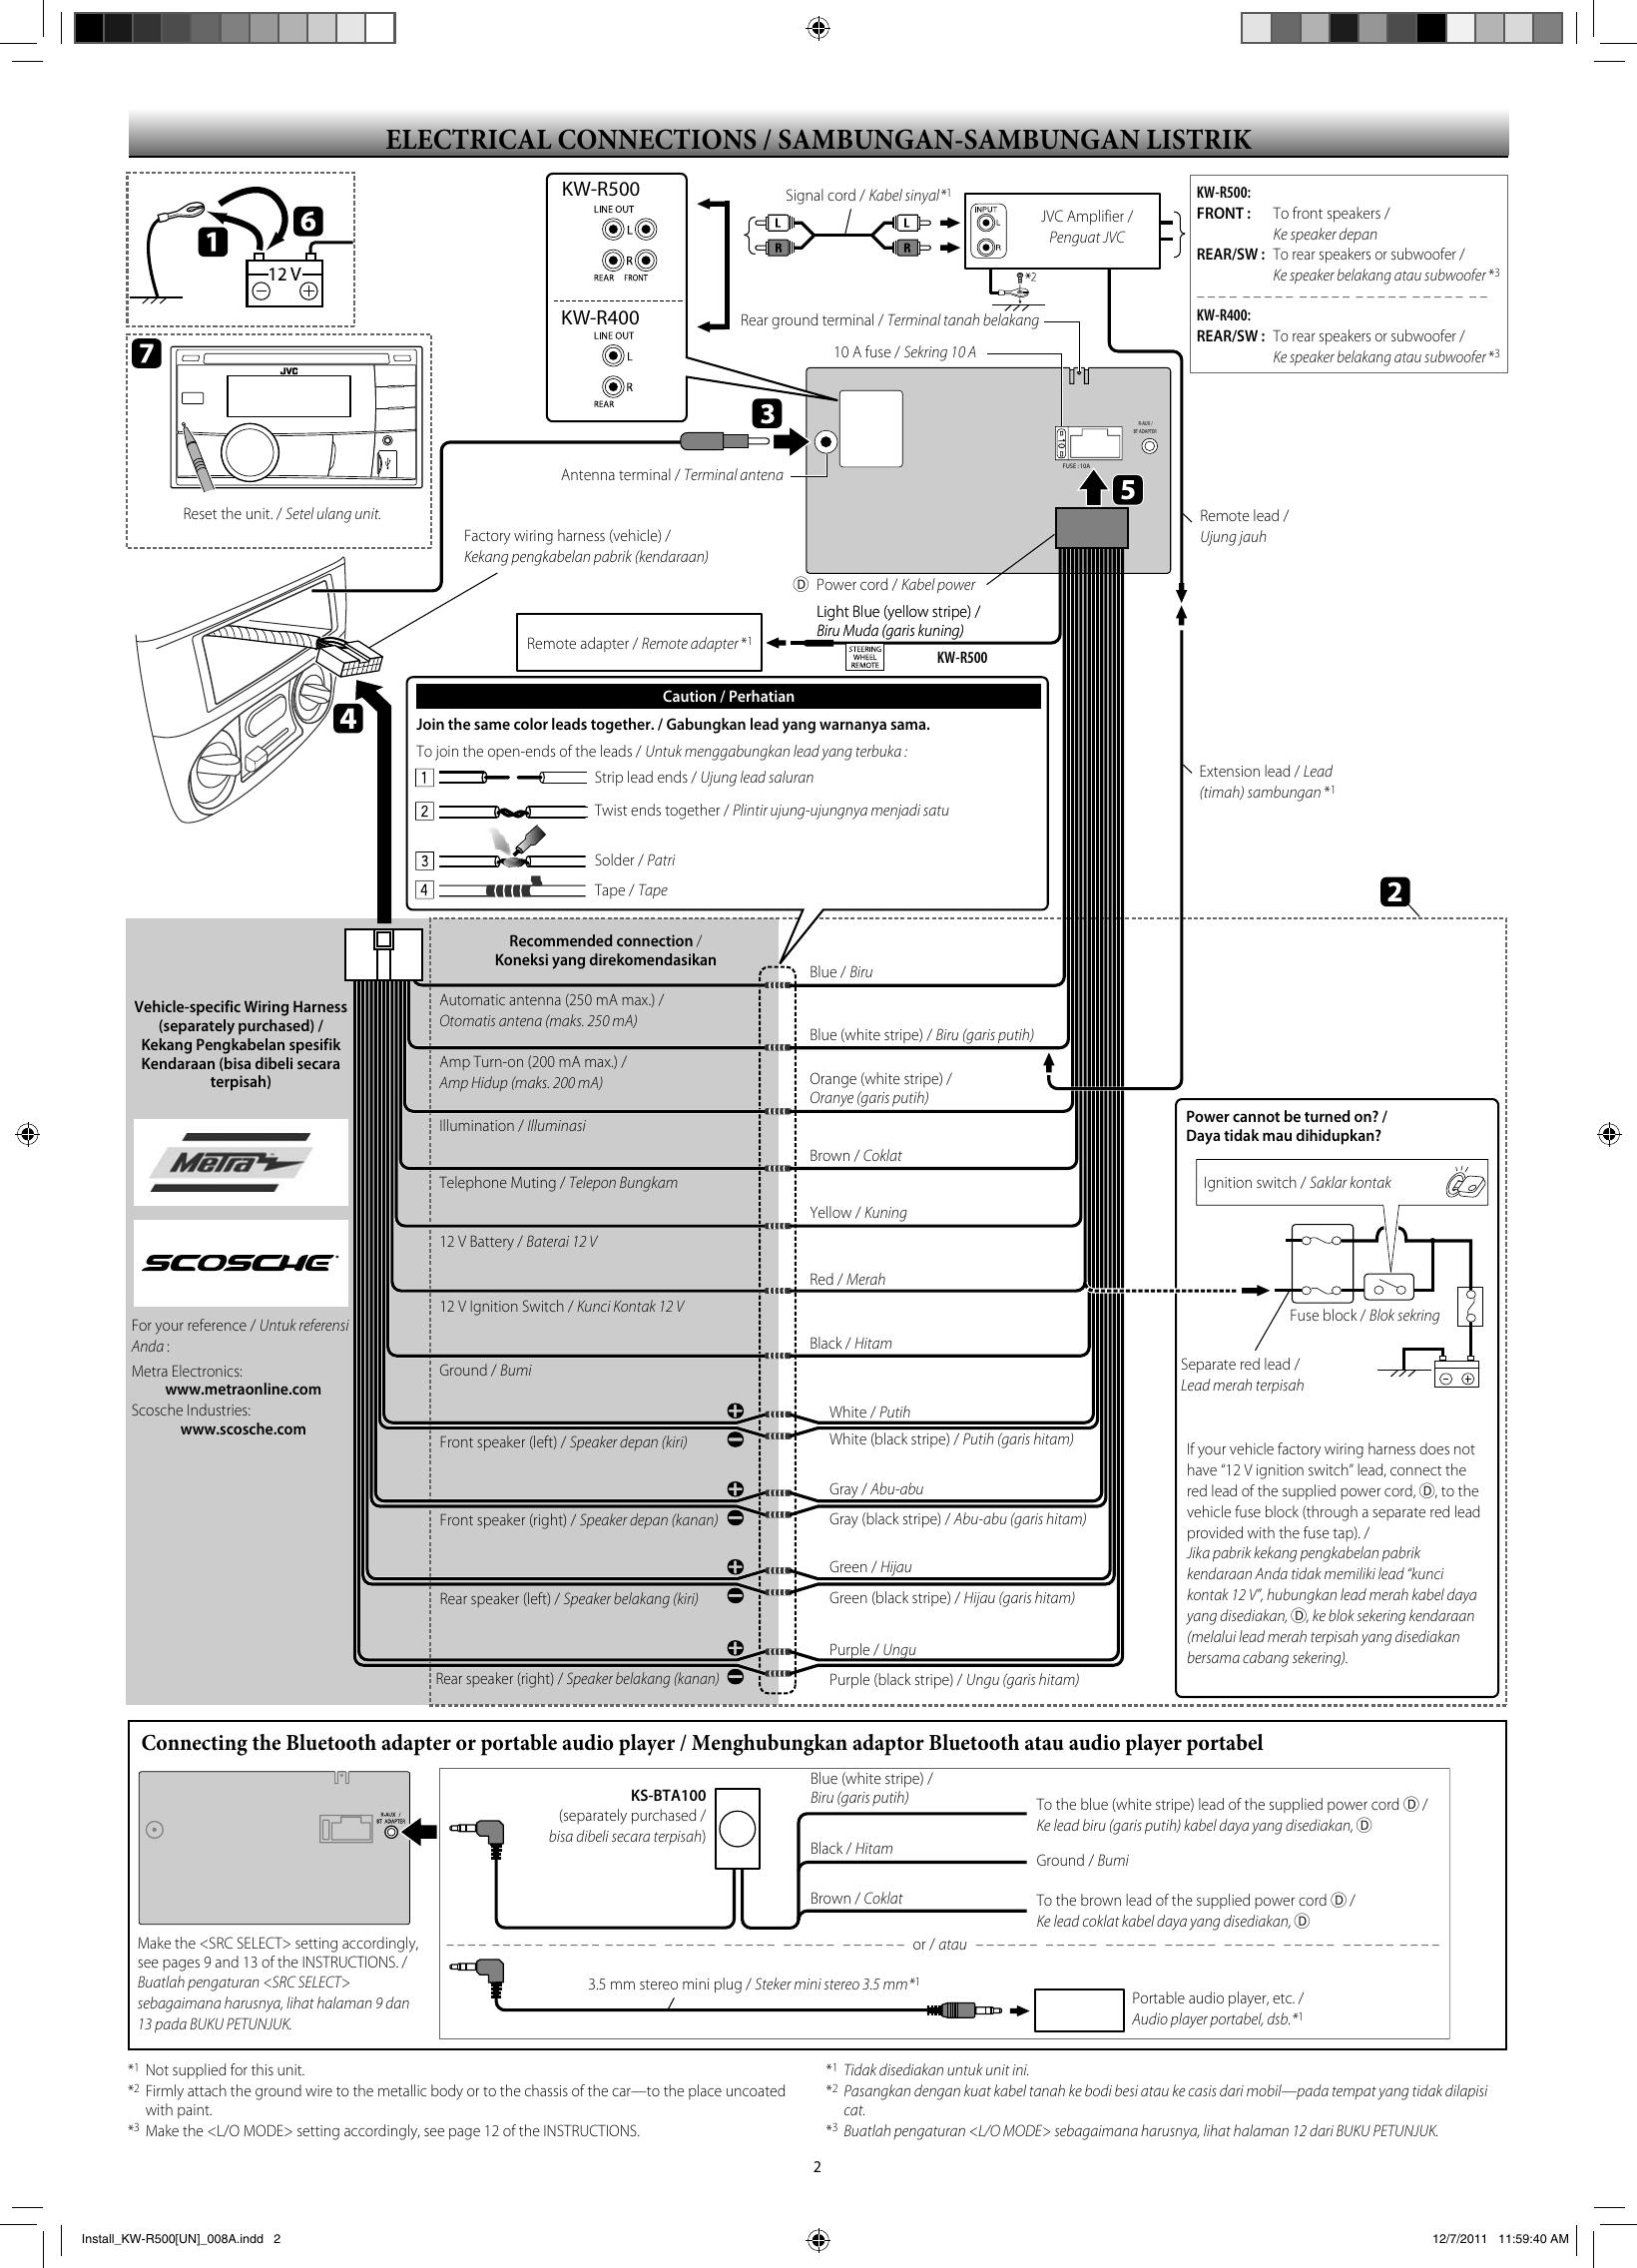 Jvc Kw Av50 Wiring Diagram from usermanual.wiki